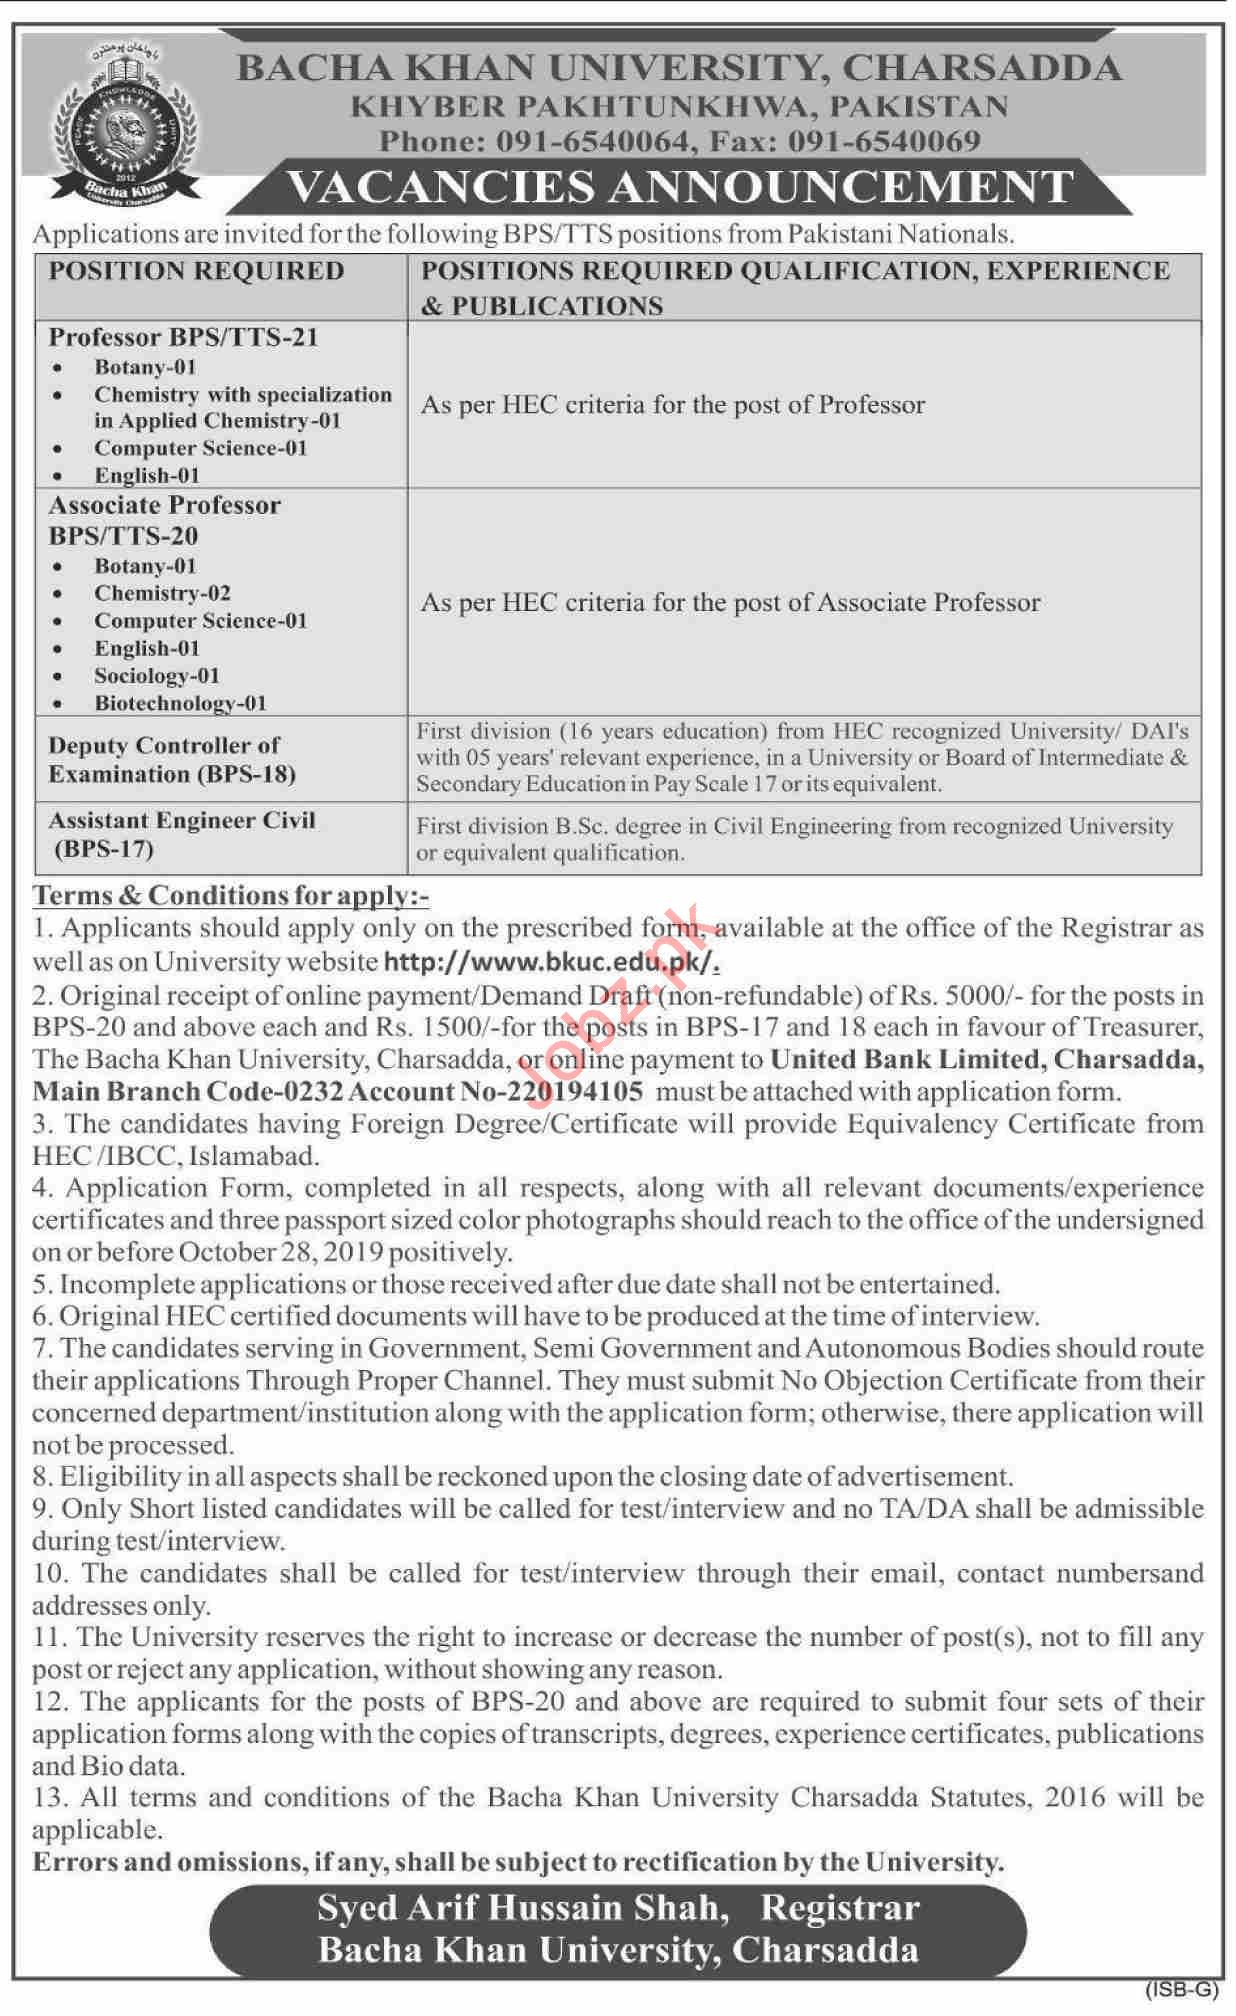 Bacha Khan University Charsadda BKUC Jobs for Professors